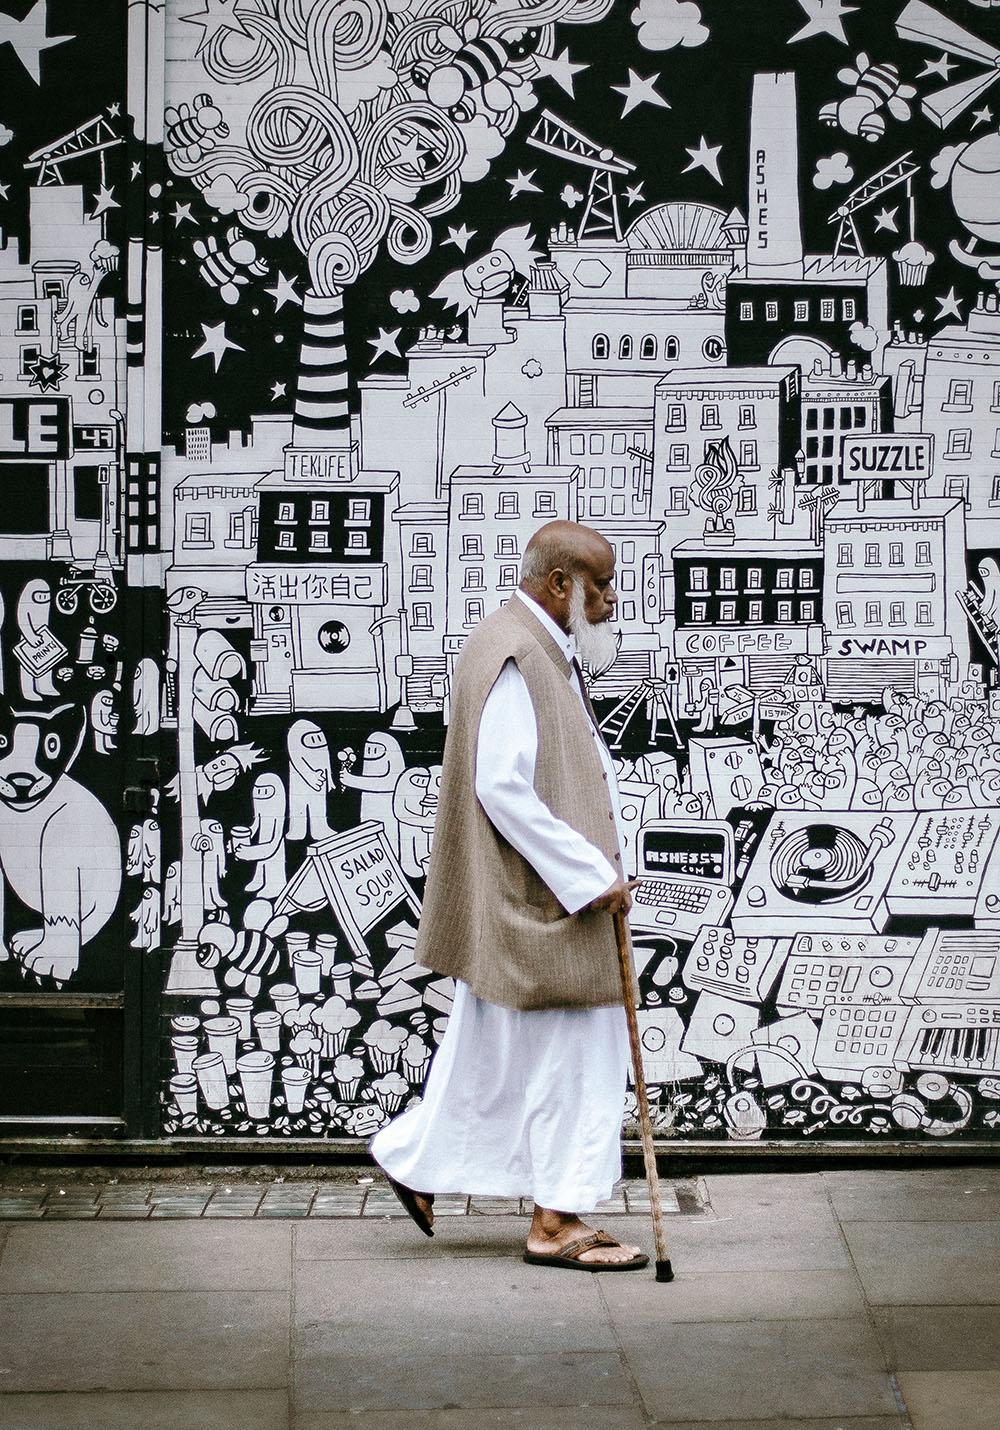 Brick Lane, London. Photo Credit: Clem Onojeghuo